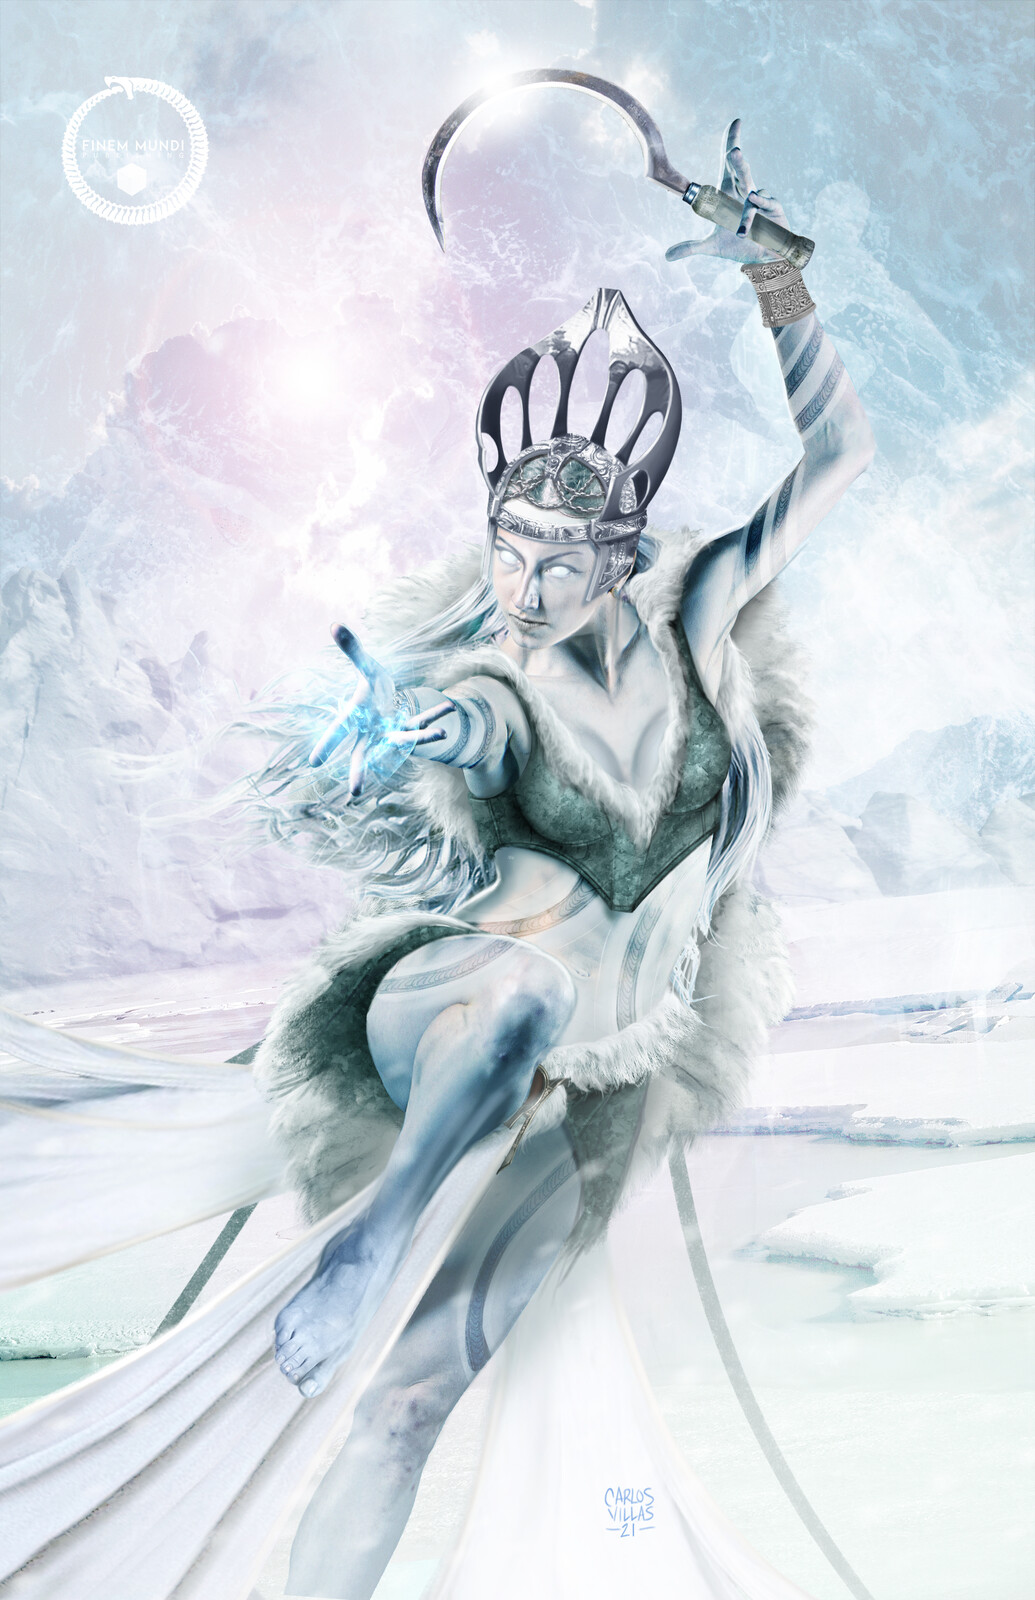 ICE QUEEN MORENA